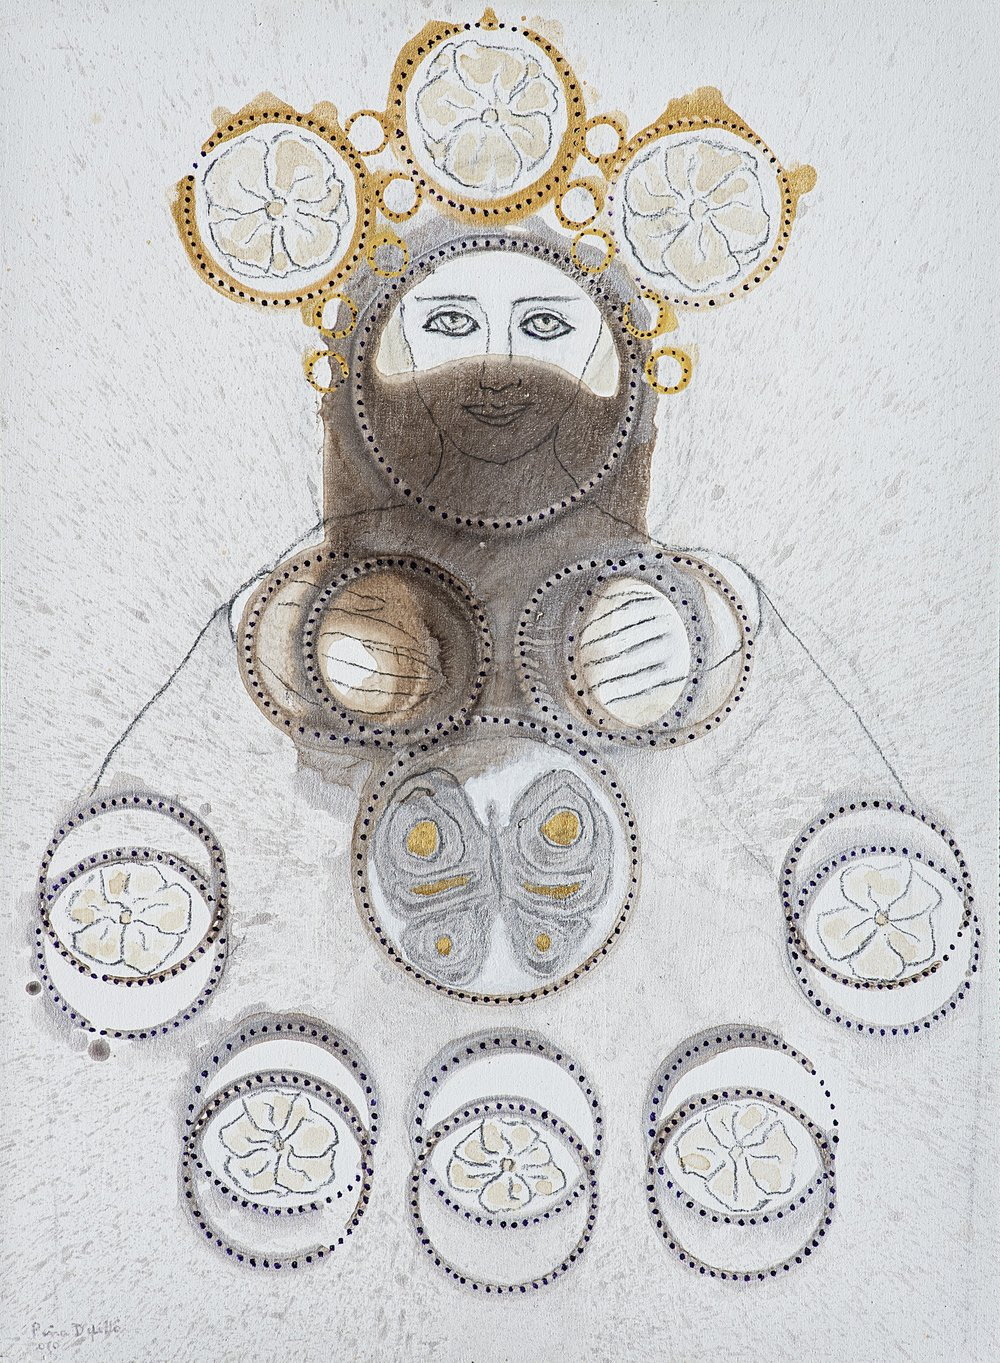 Virginal reverie (2010). Fernando Peña Defilló